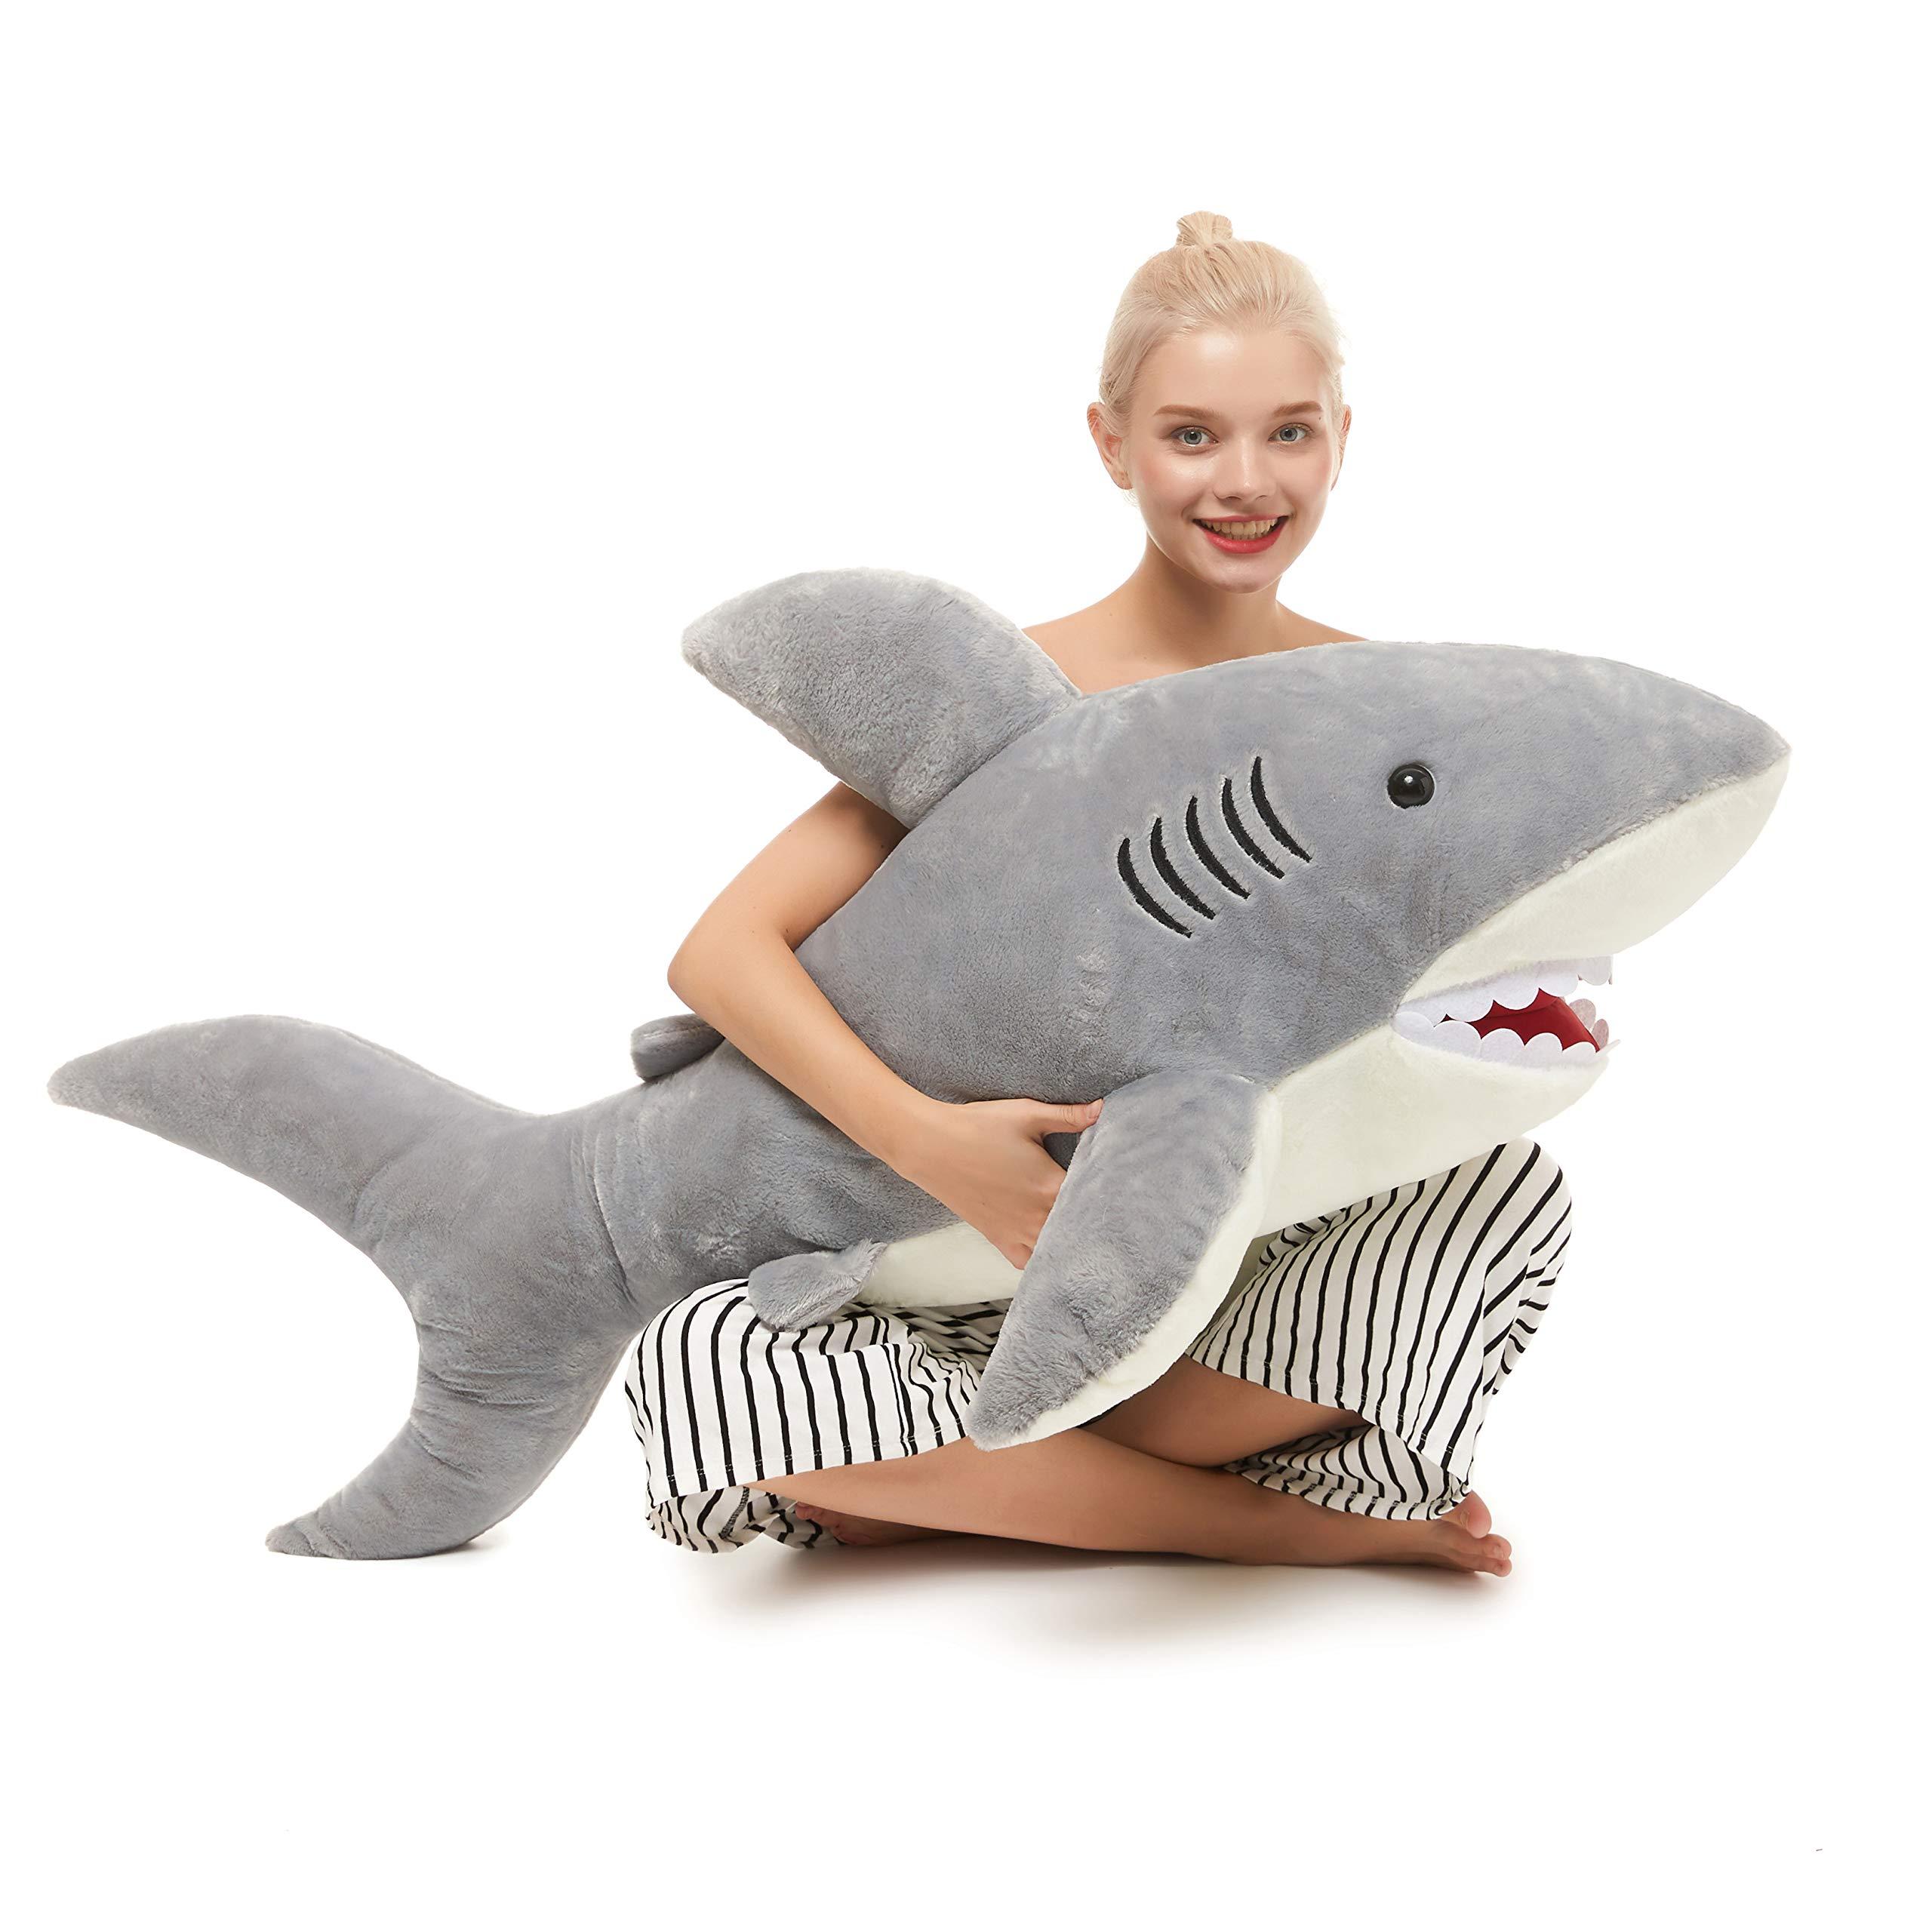 MorisMos Giant Shark Stuffed Animal,Gray Shark Plush Pillow,Plush Toy,Gift for Kids Girlfriend,51 Inches by MorisMos (Image #3)